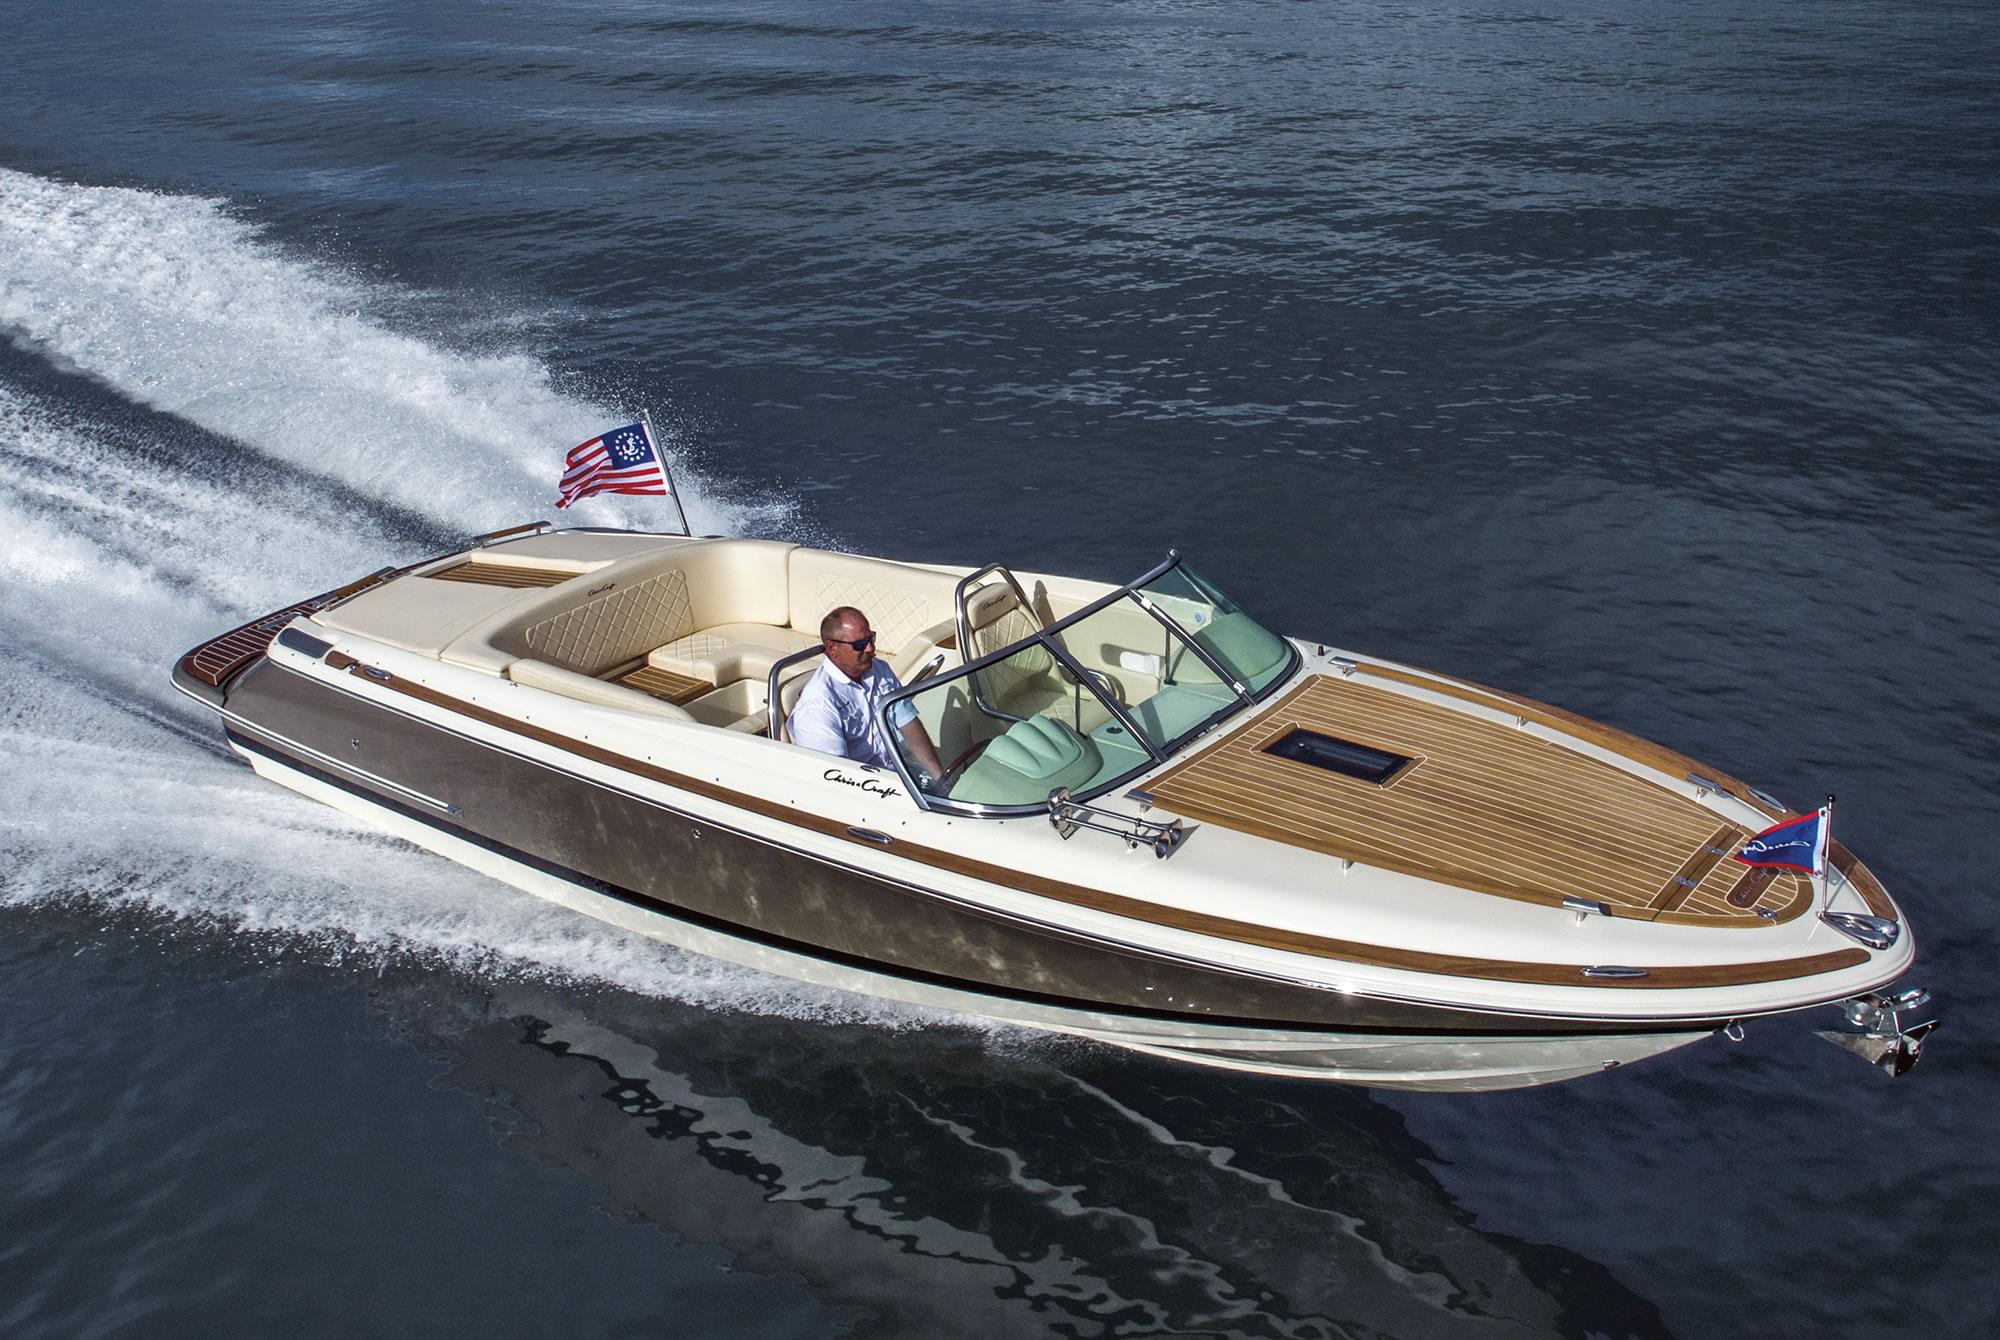 Corsair 27 Chris Craft Boats